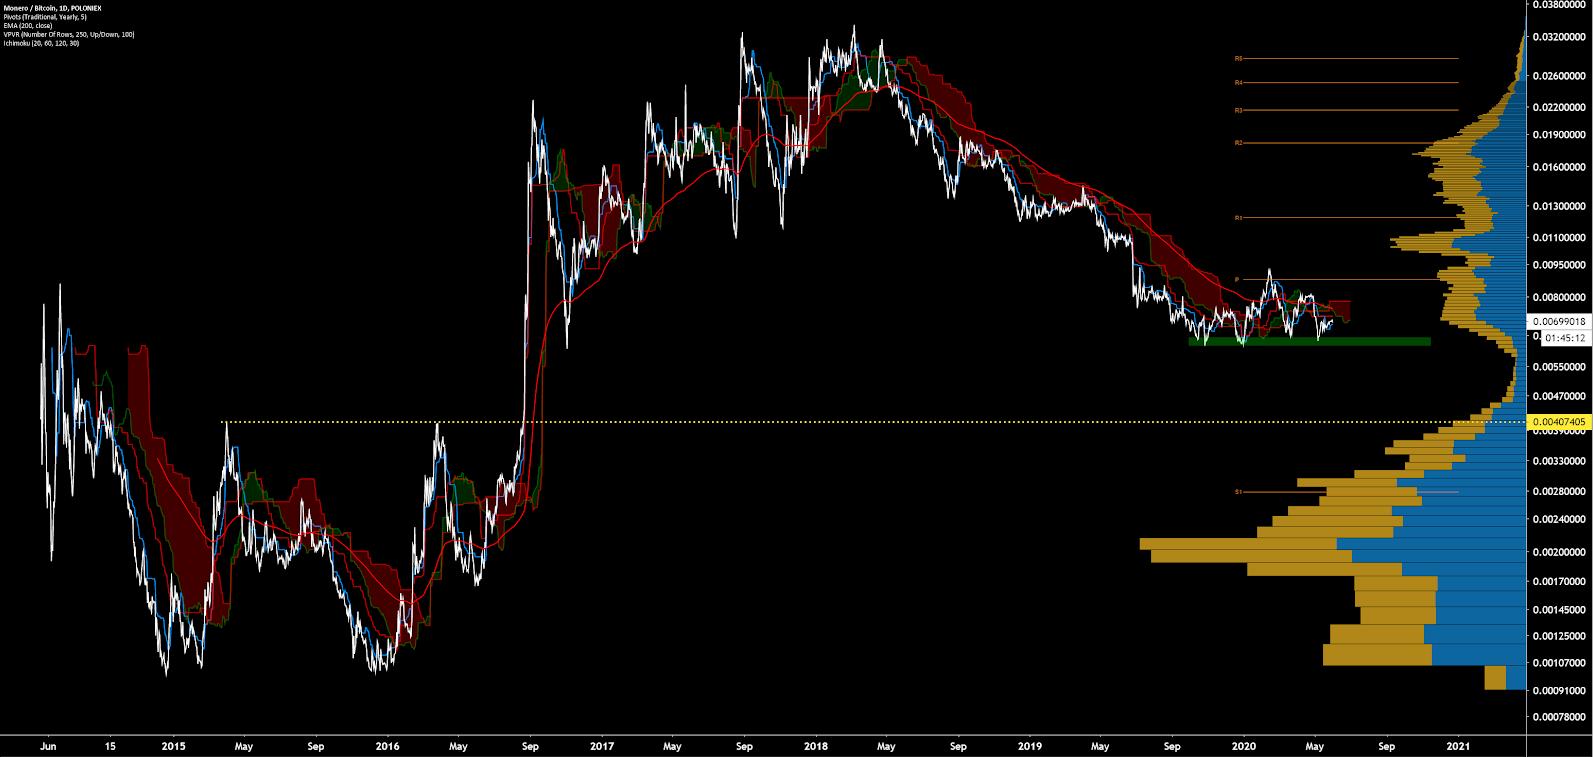 Monero Price Analysis 1 Jun 2020 (14)